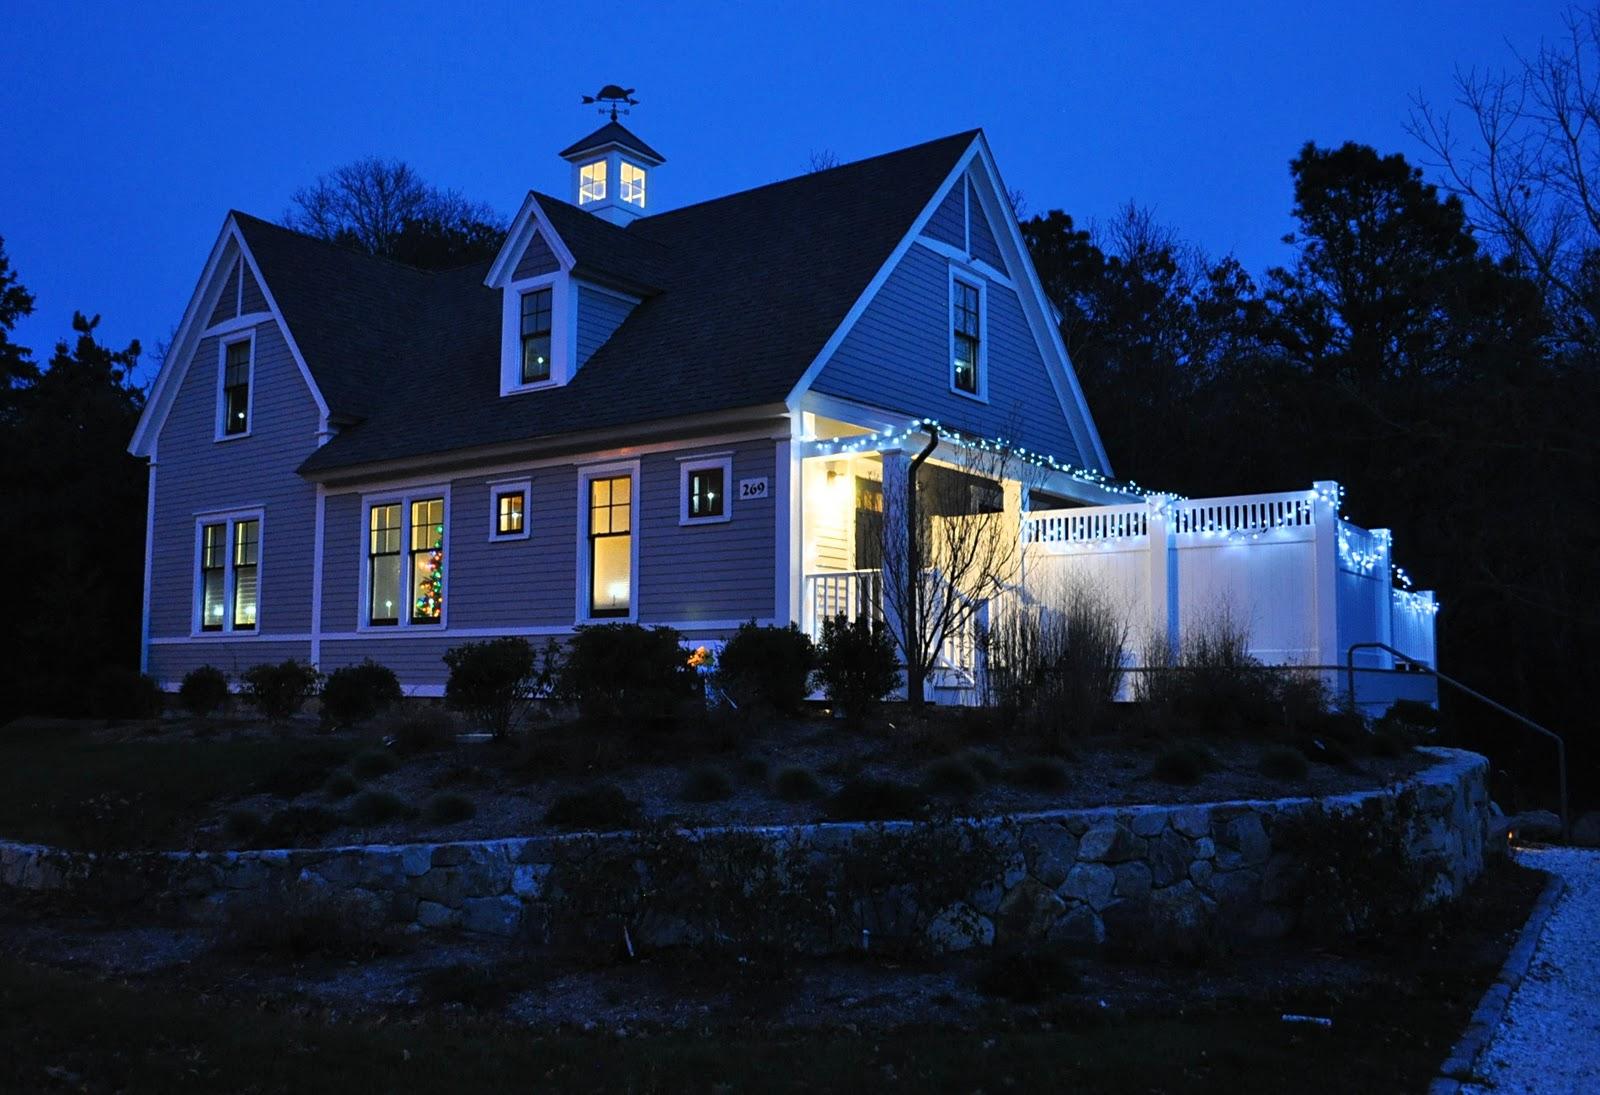 lights village house - photo #11